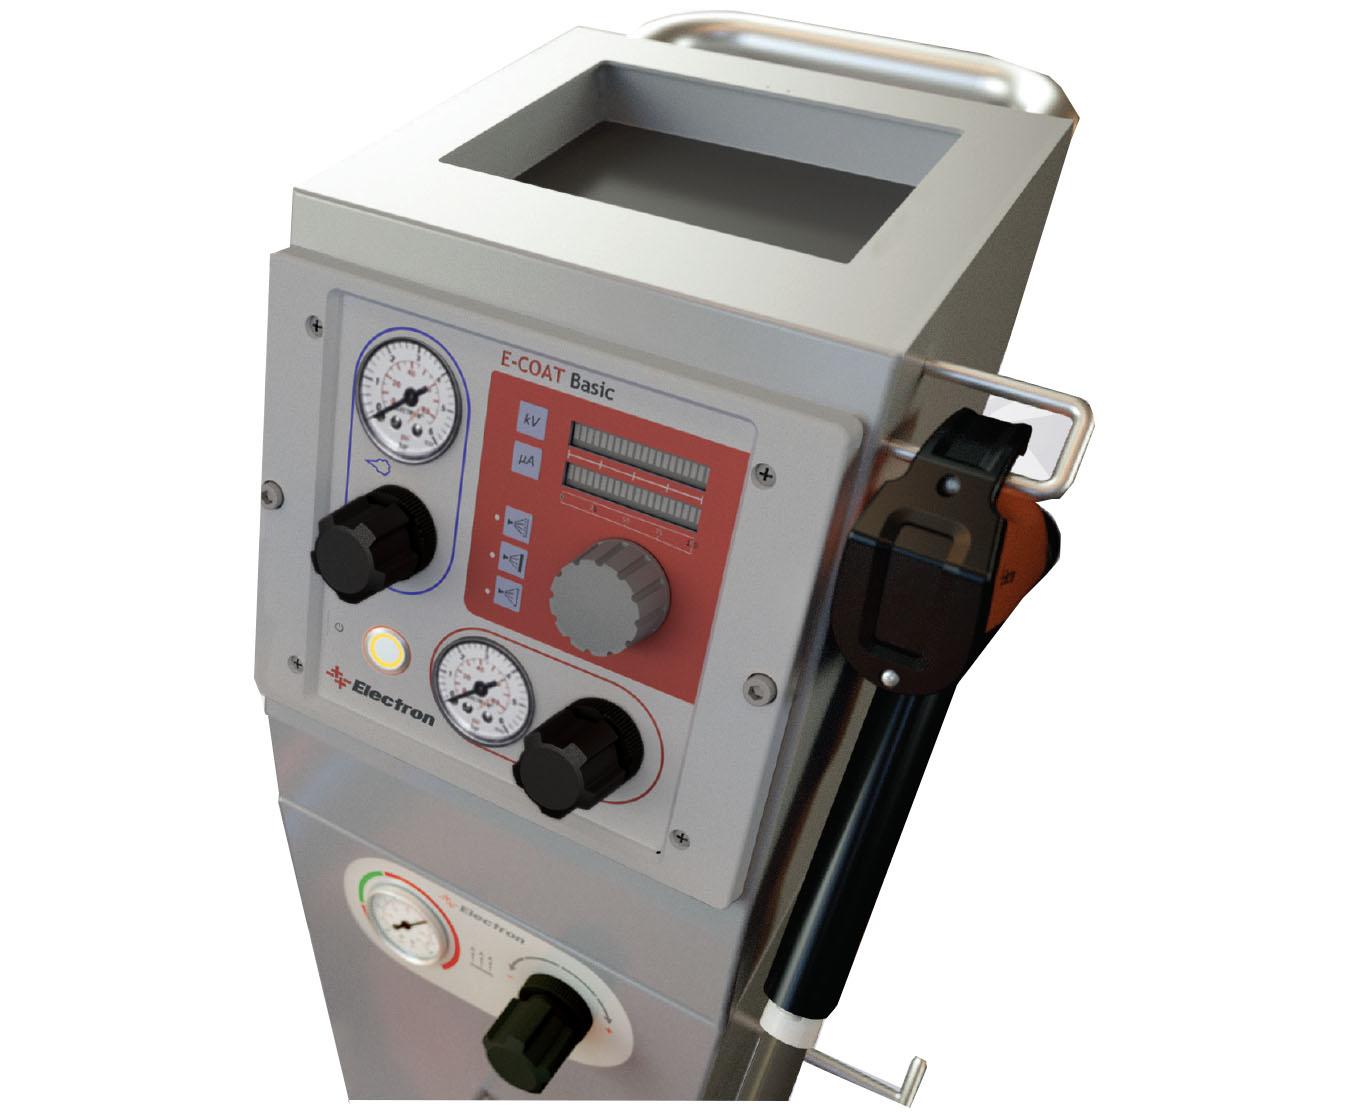 Electron Electron E-COAT Basic Series –   M